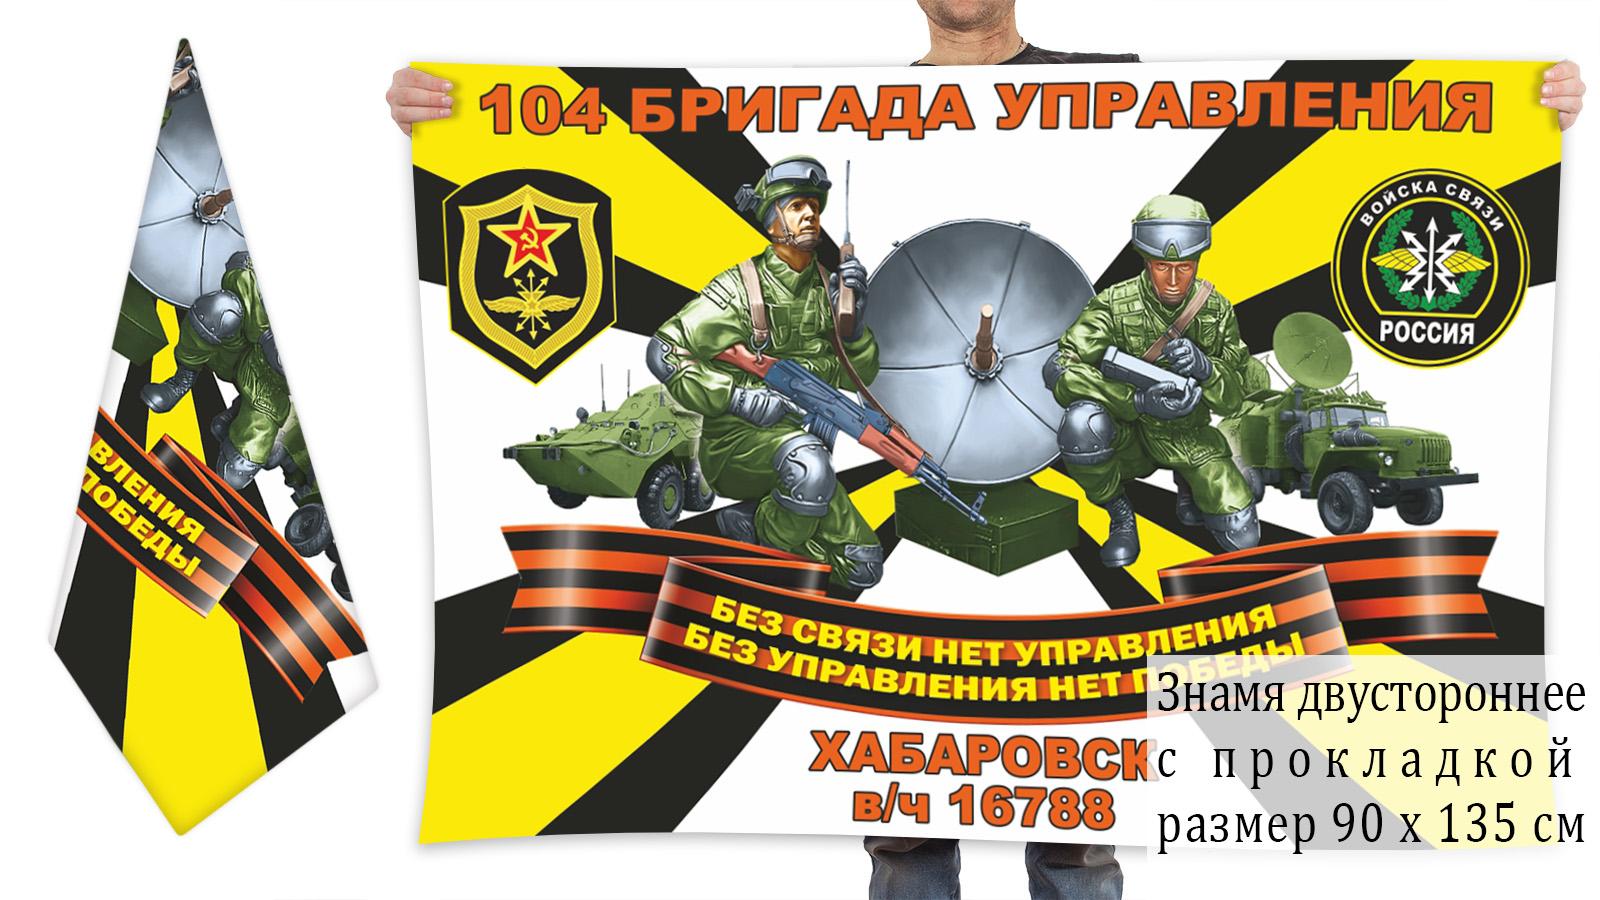 Двусторонний флаг 104 бригада управления войск связи